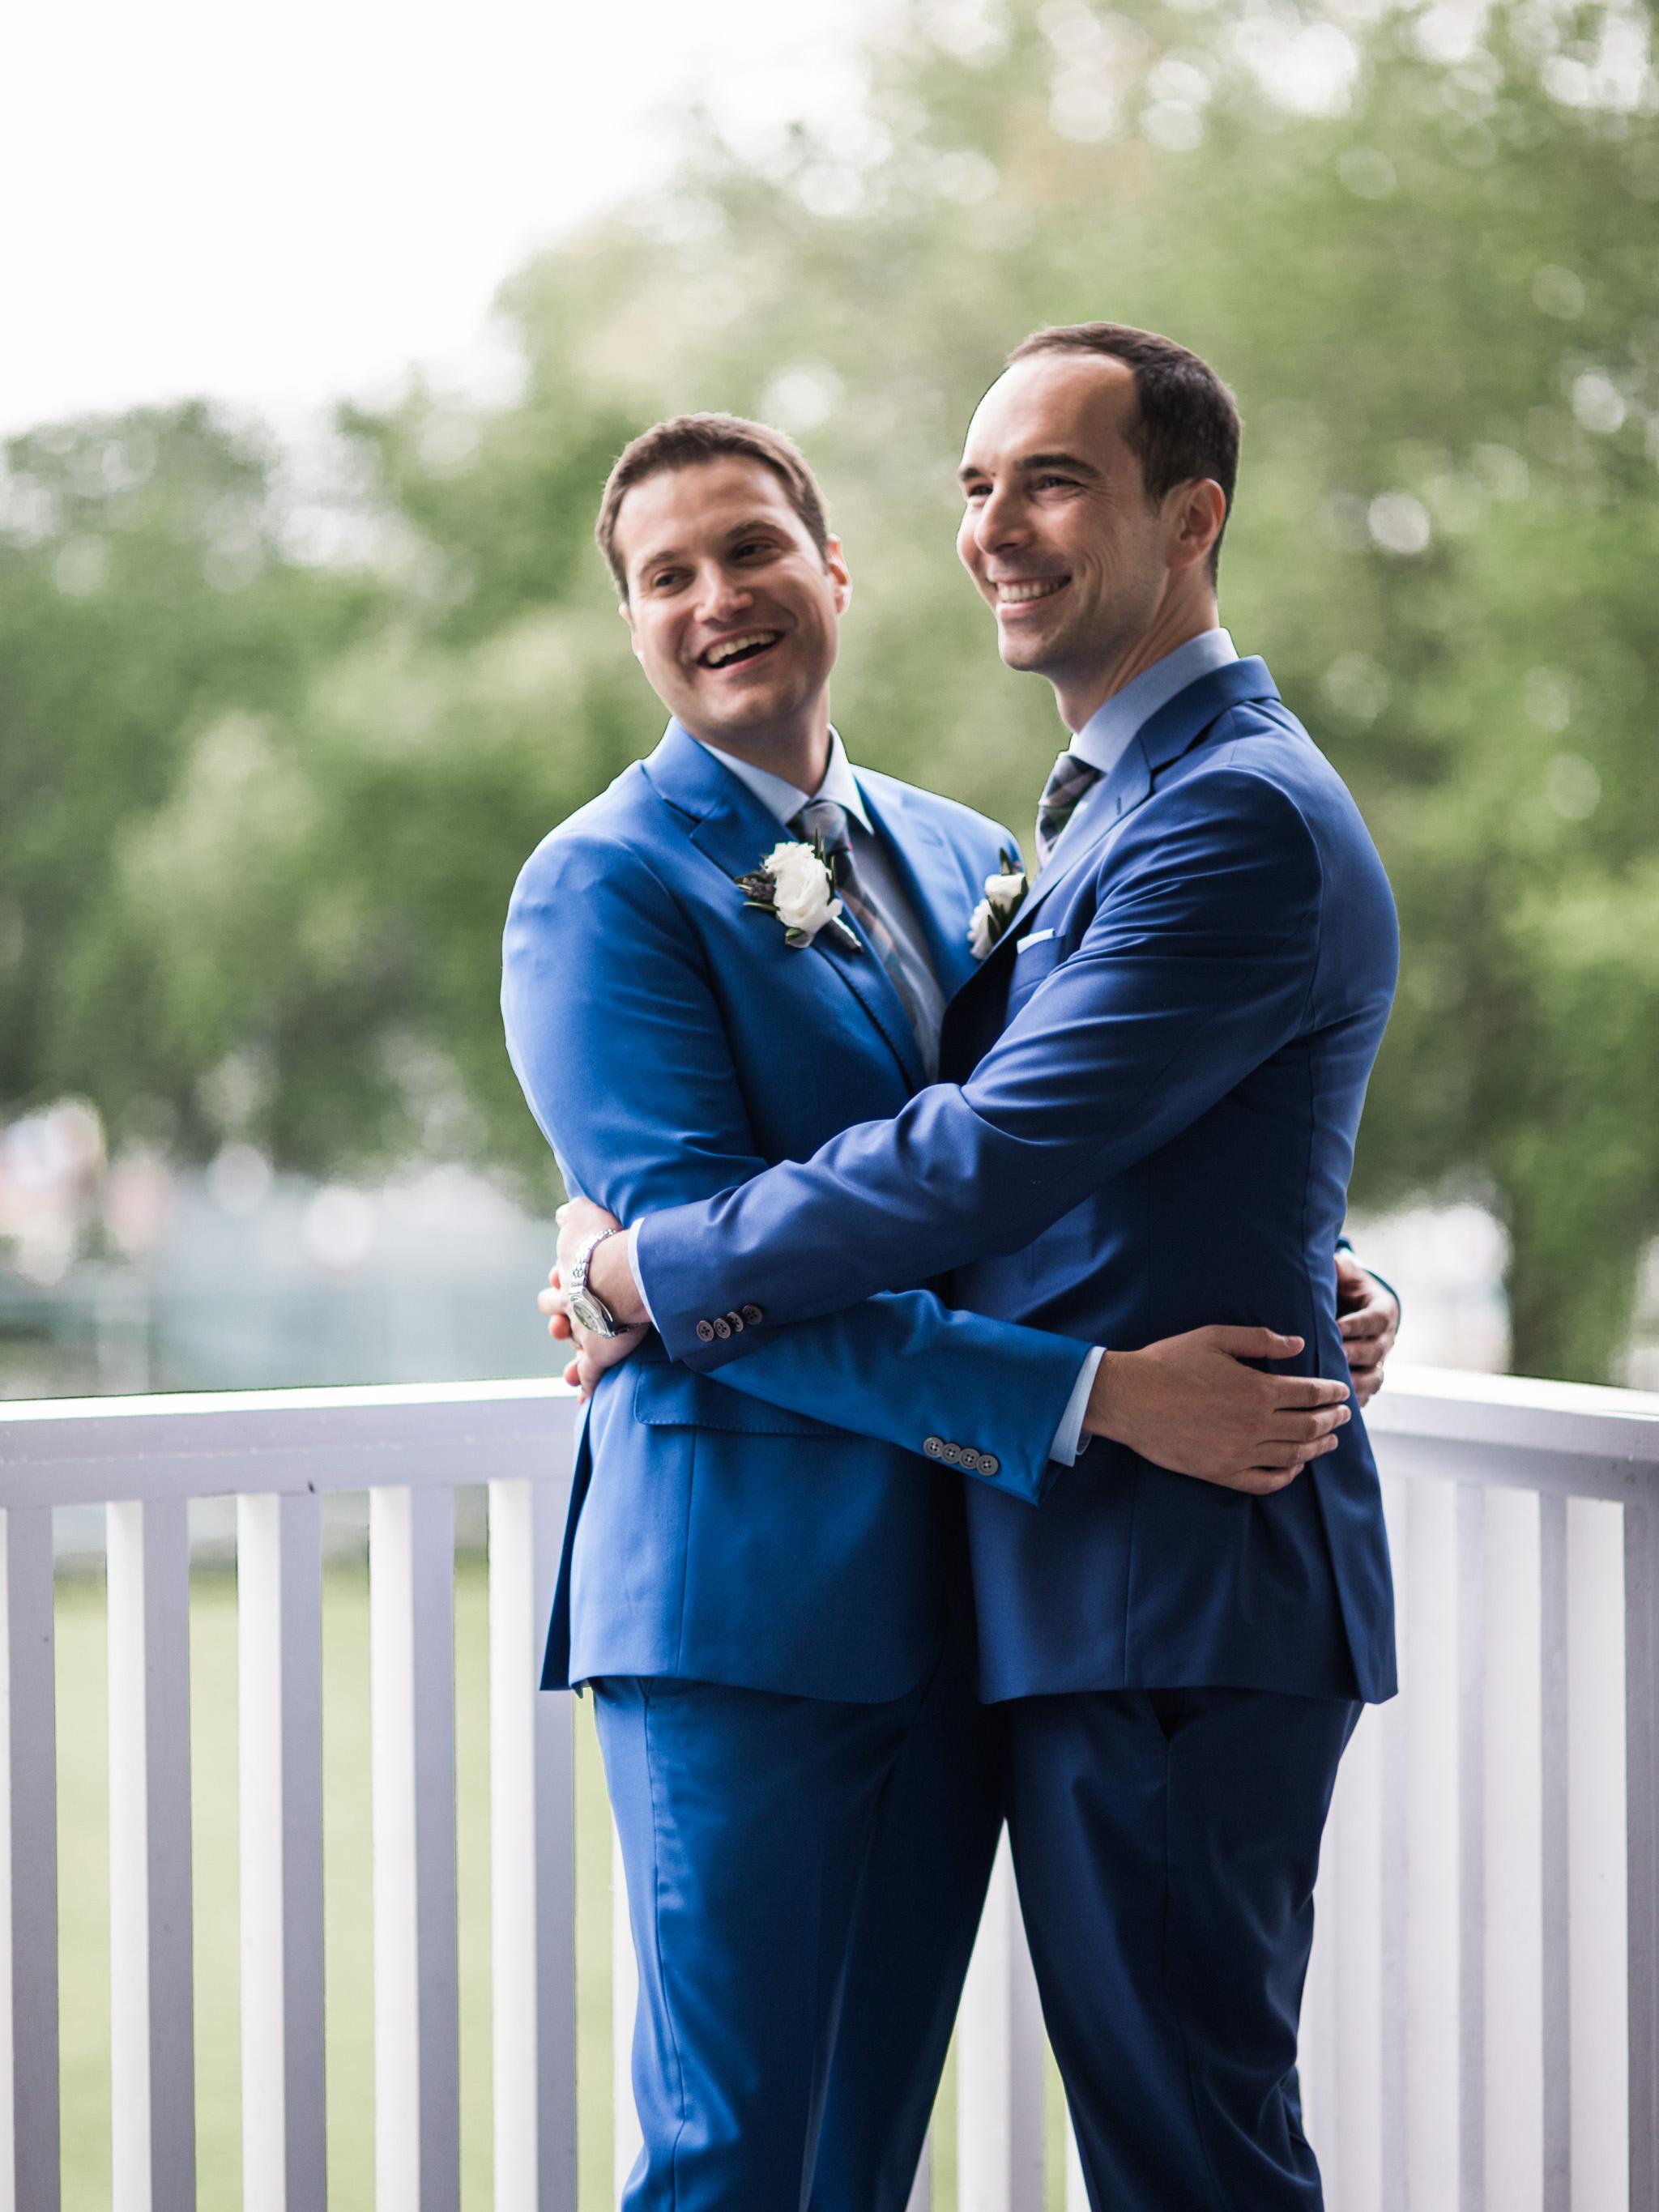 toronto-island-Royal-canadian-yacht-club-wedding-photographer-47